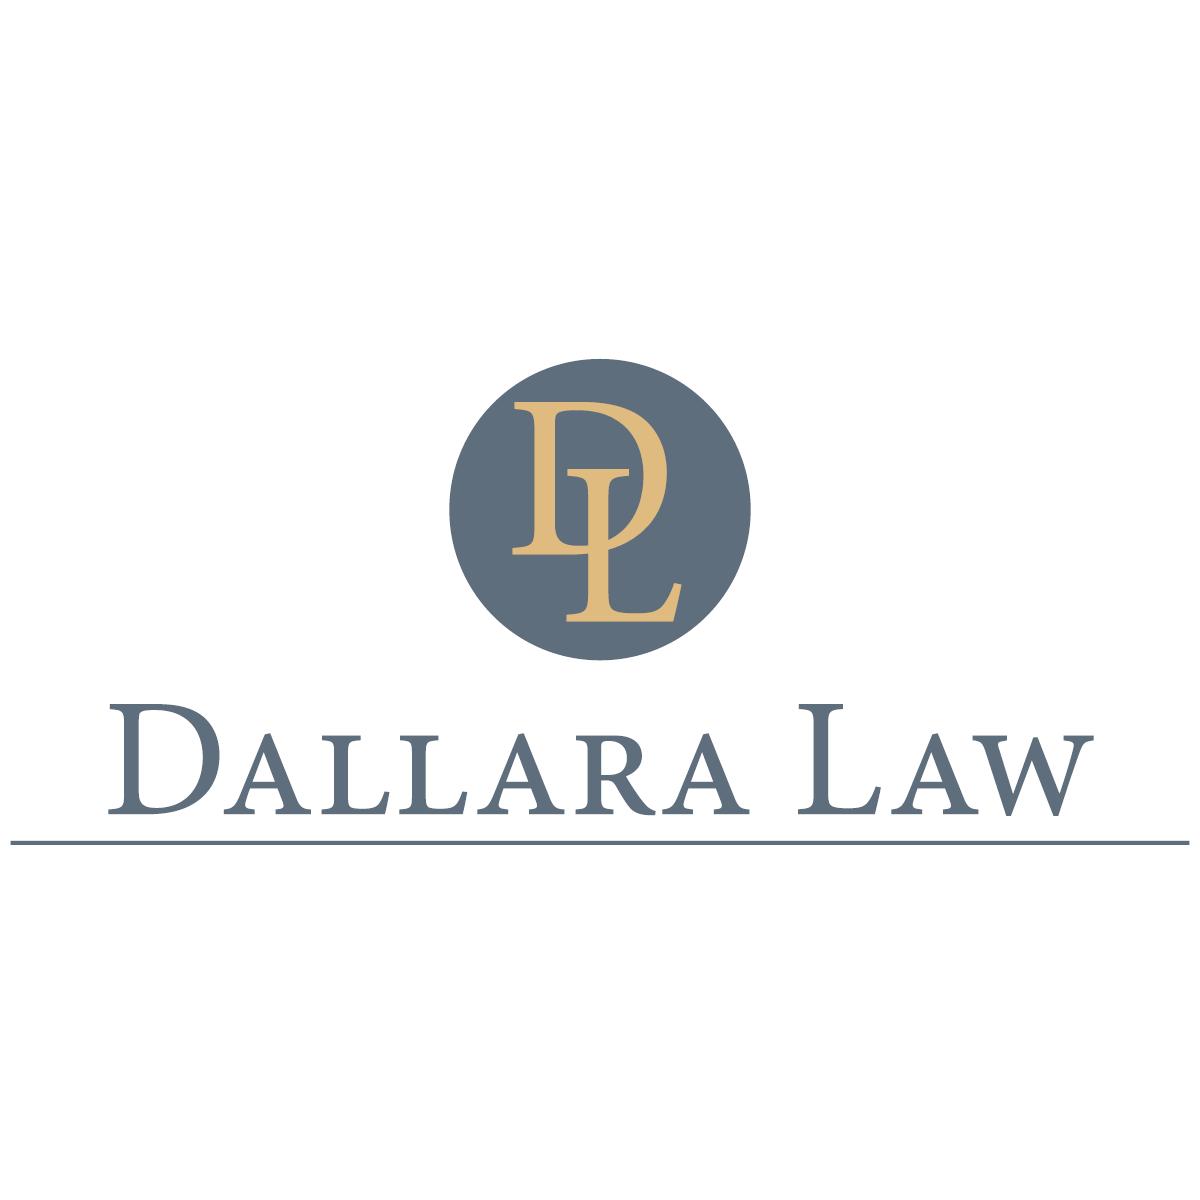 DALLARA LAW